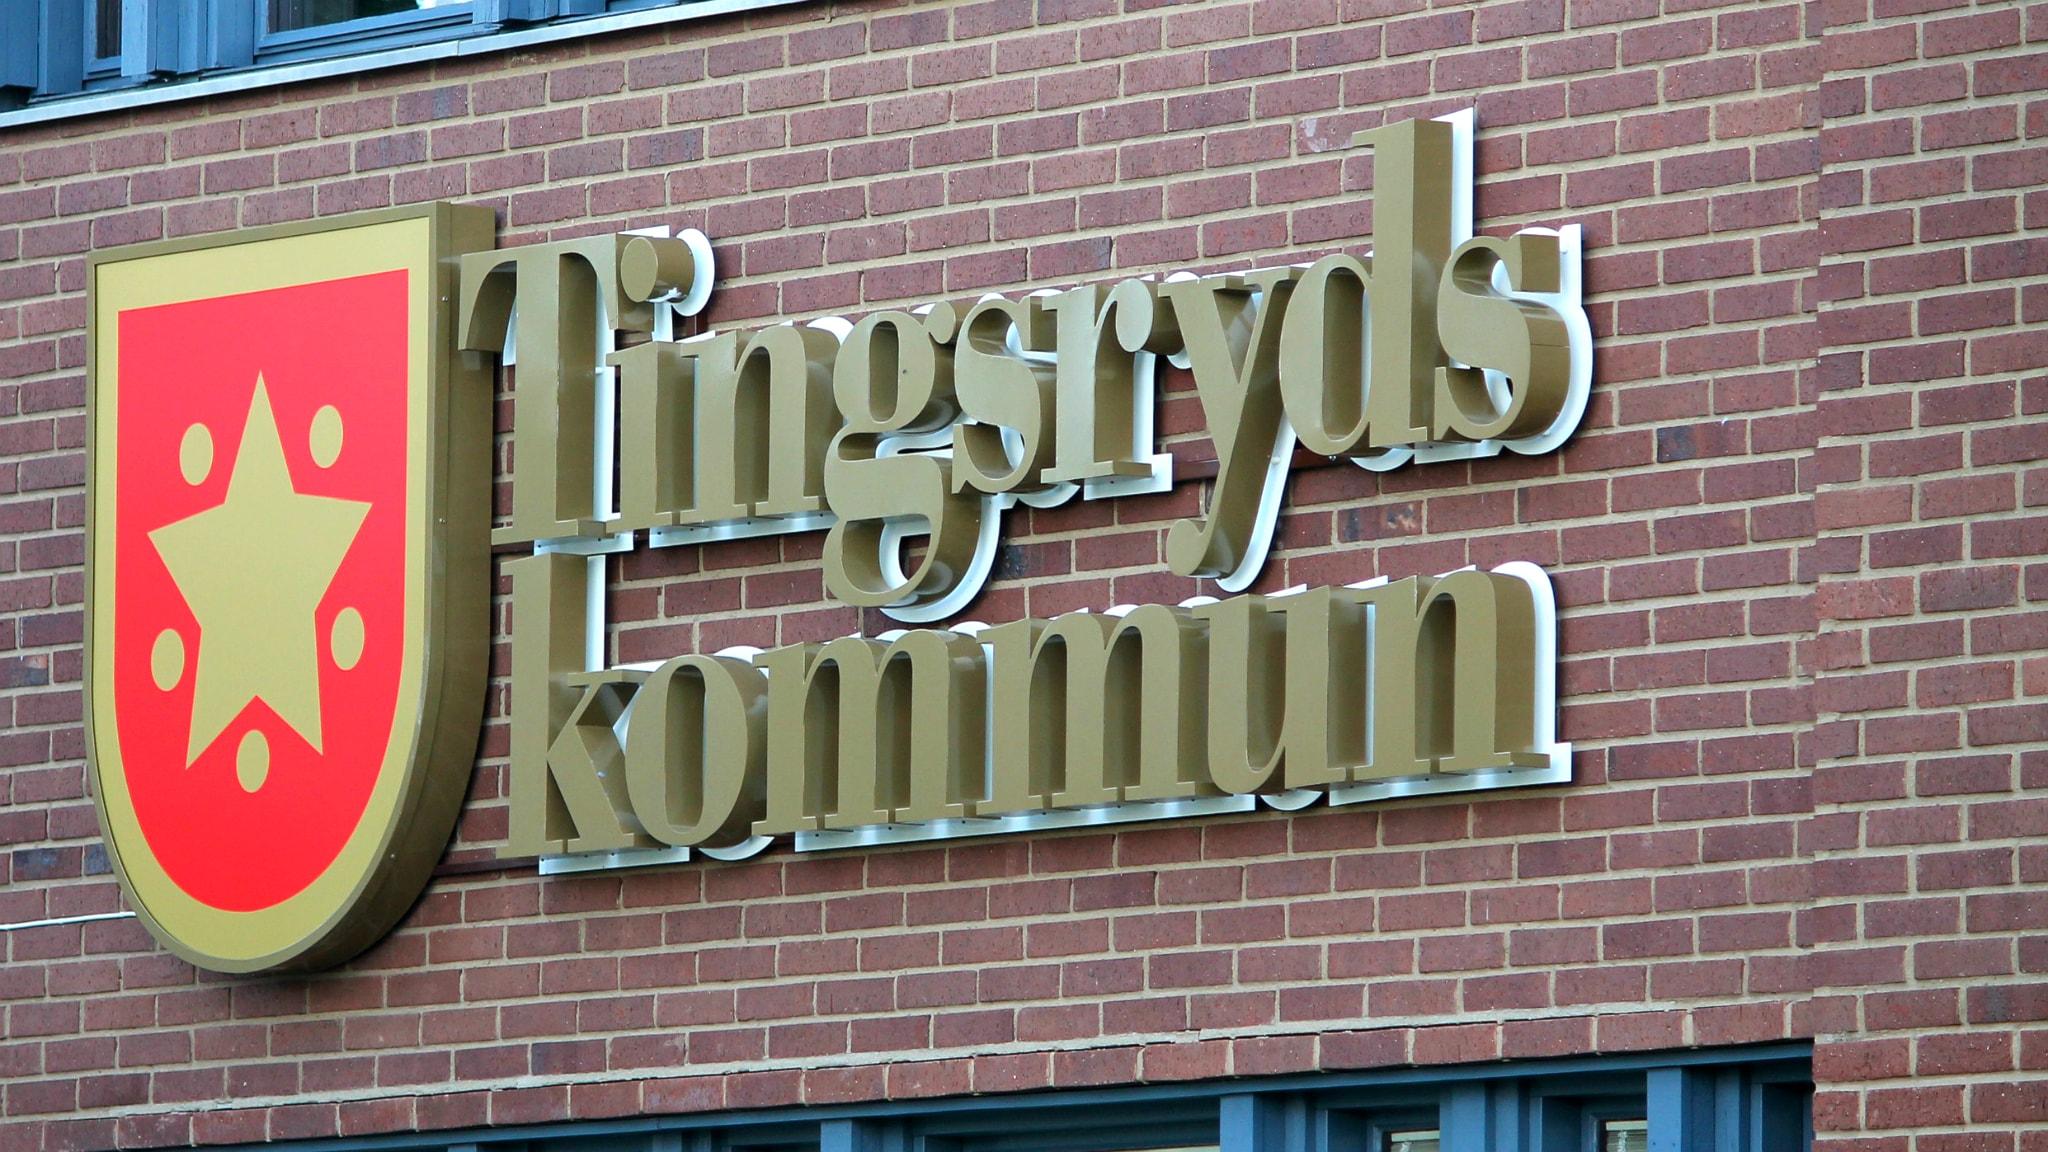 Anette Lennartsson, Travvgen 2, Tingsryd | unam.net